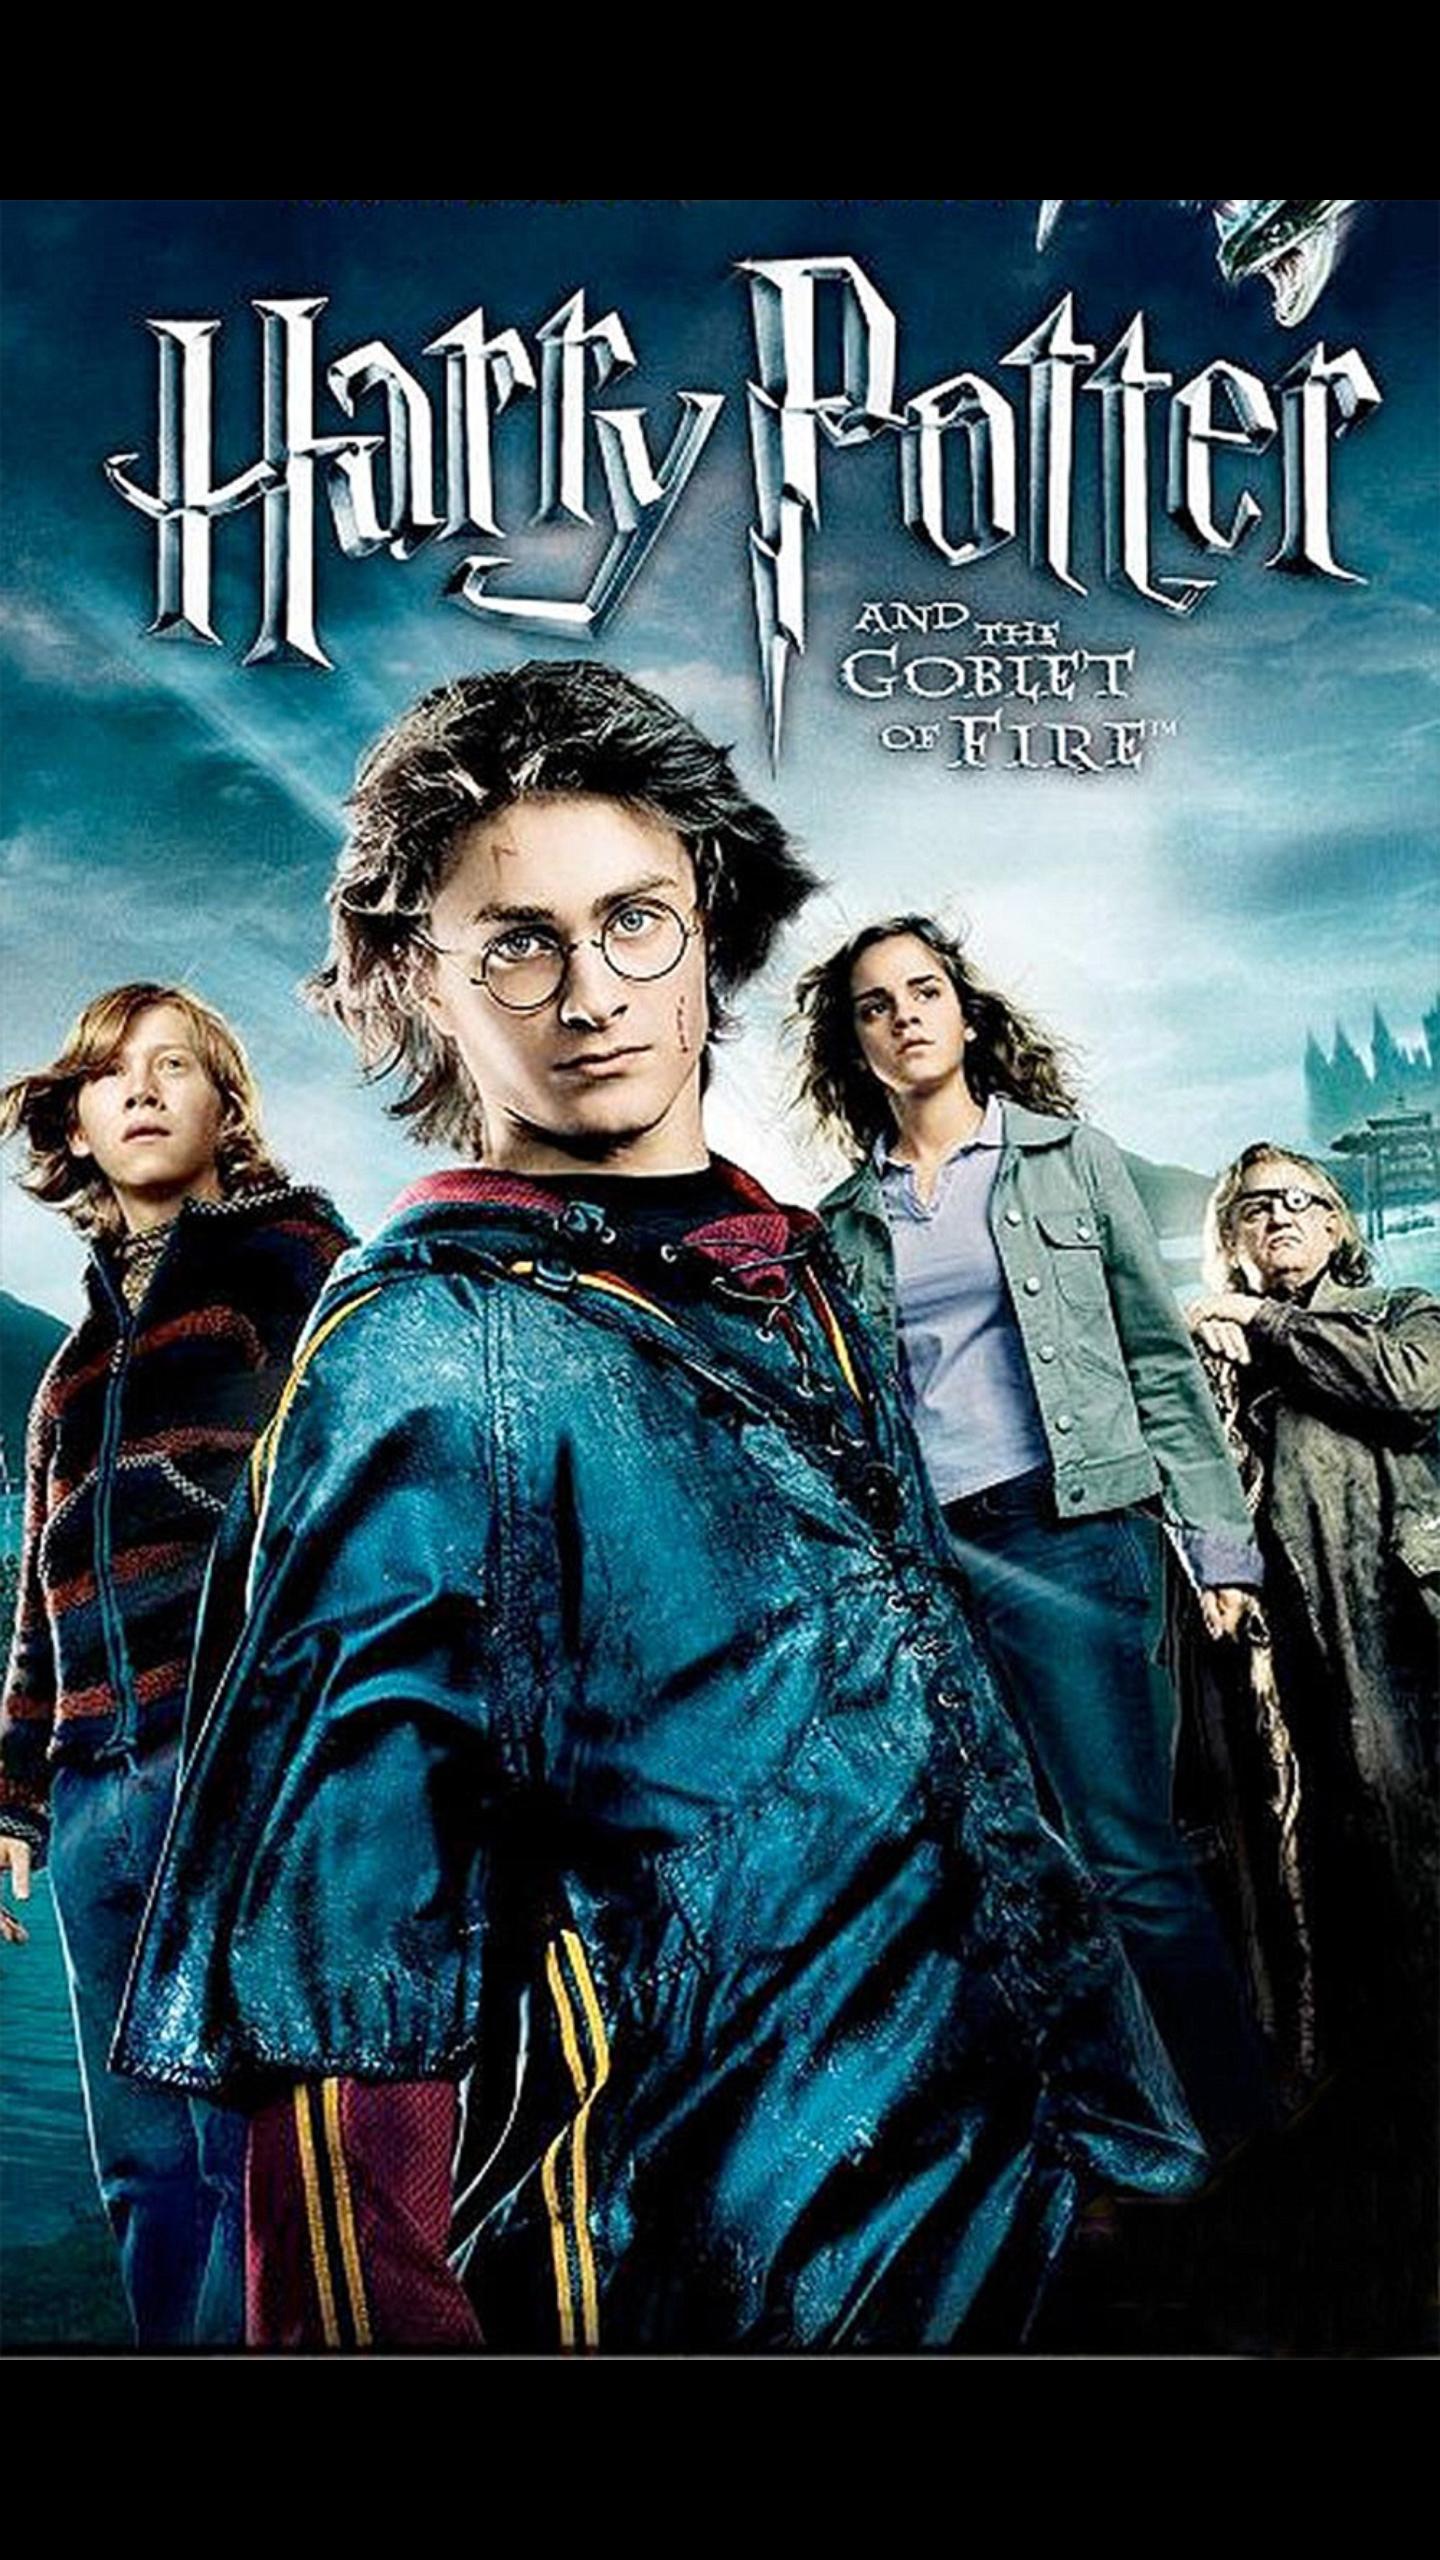 Assistir Harry Potter E A Pedra Filosofal Online Hd 1080p Mmfilmes Hd Assistir Filmes Gratis Dublado Assistir Filmes Gratis Harry Potter Todos Os Filmes